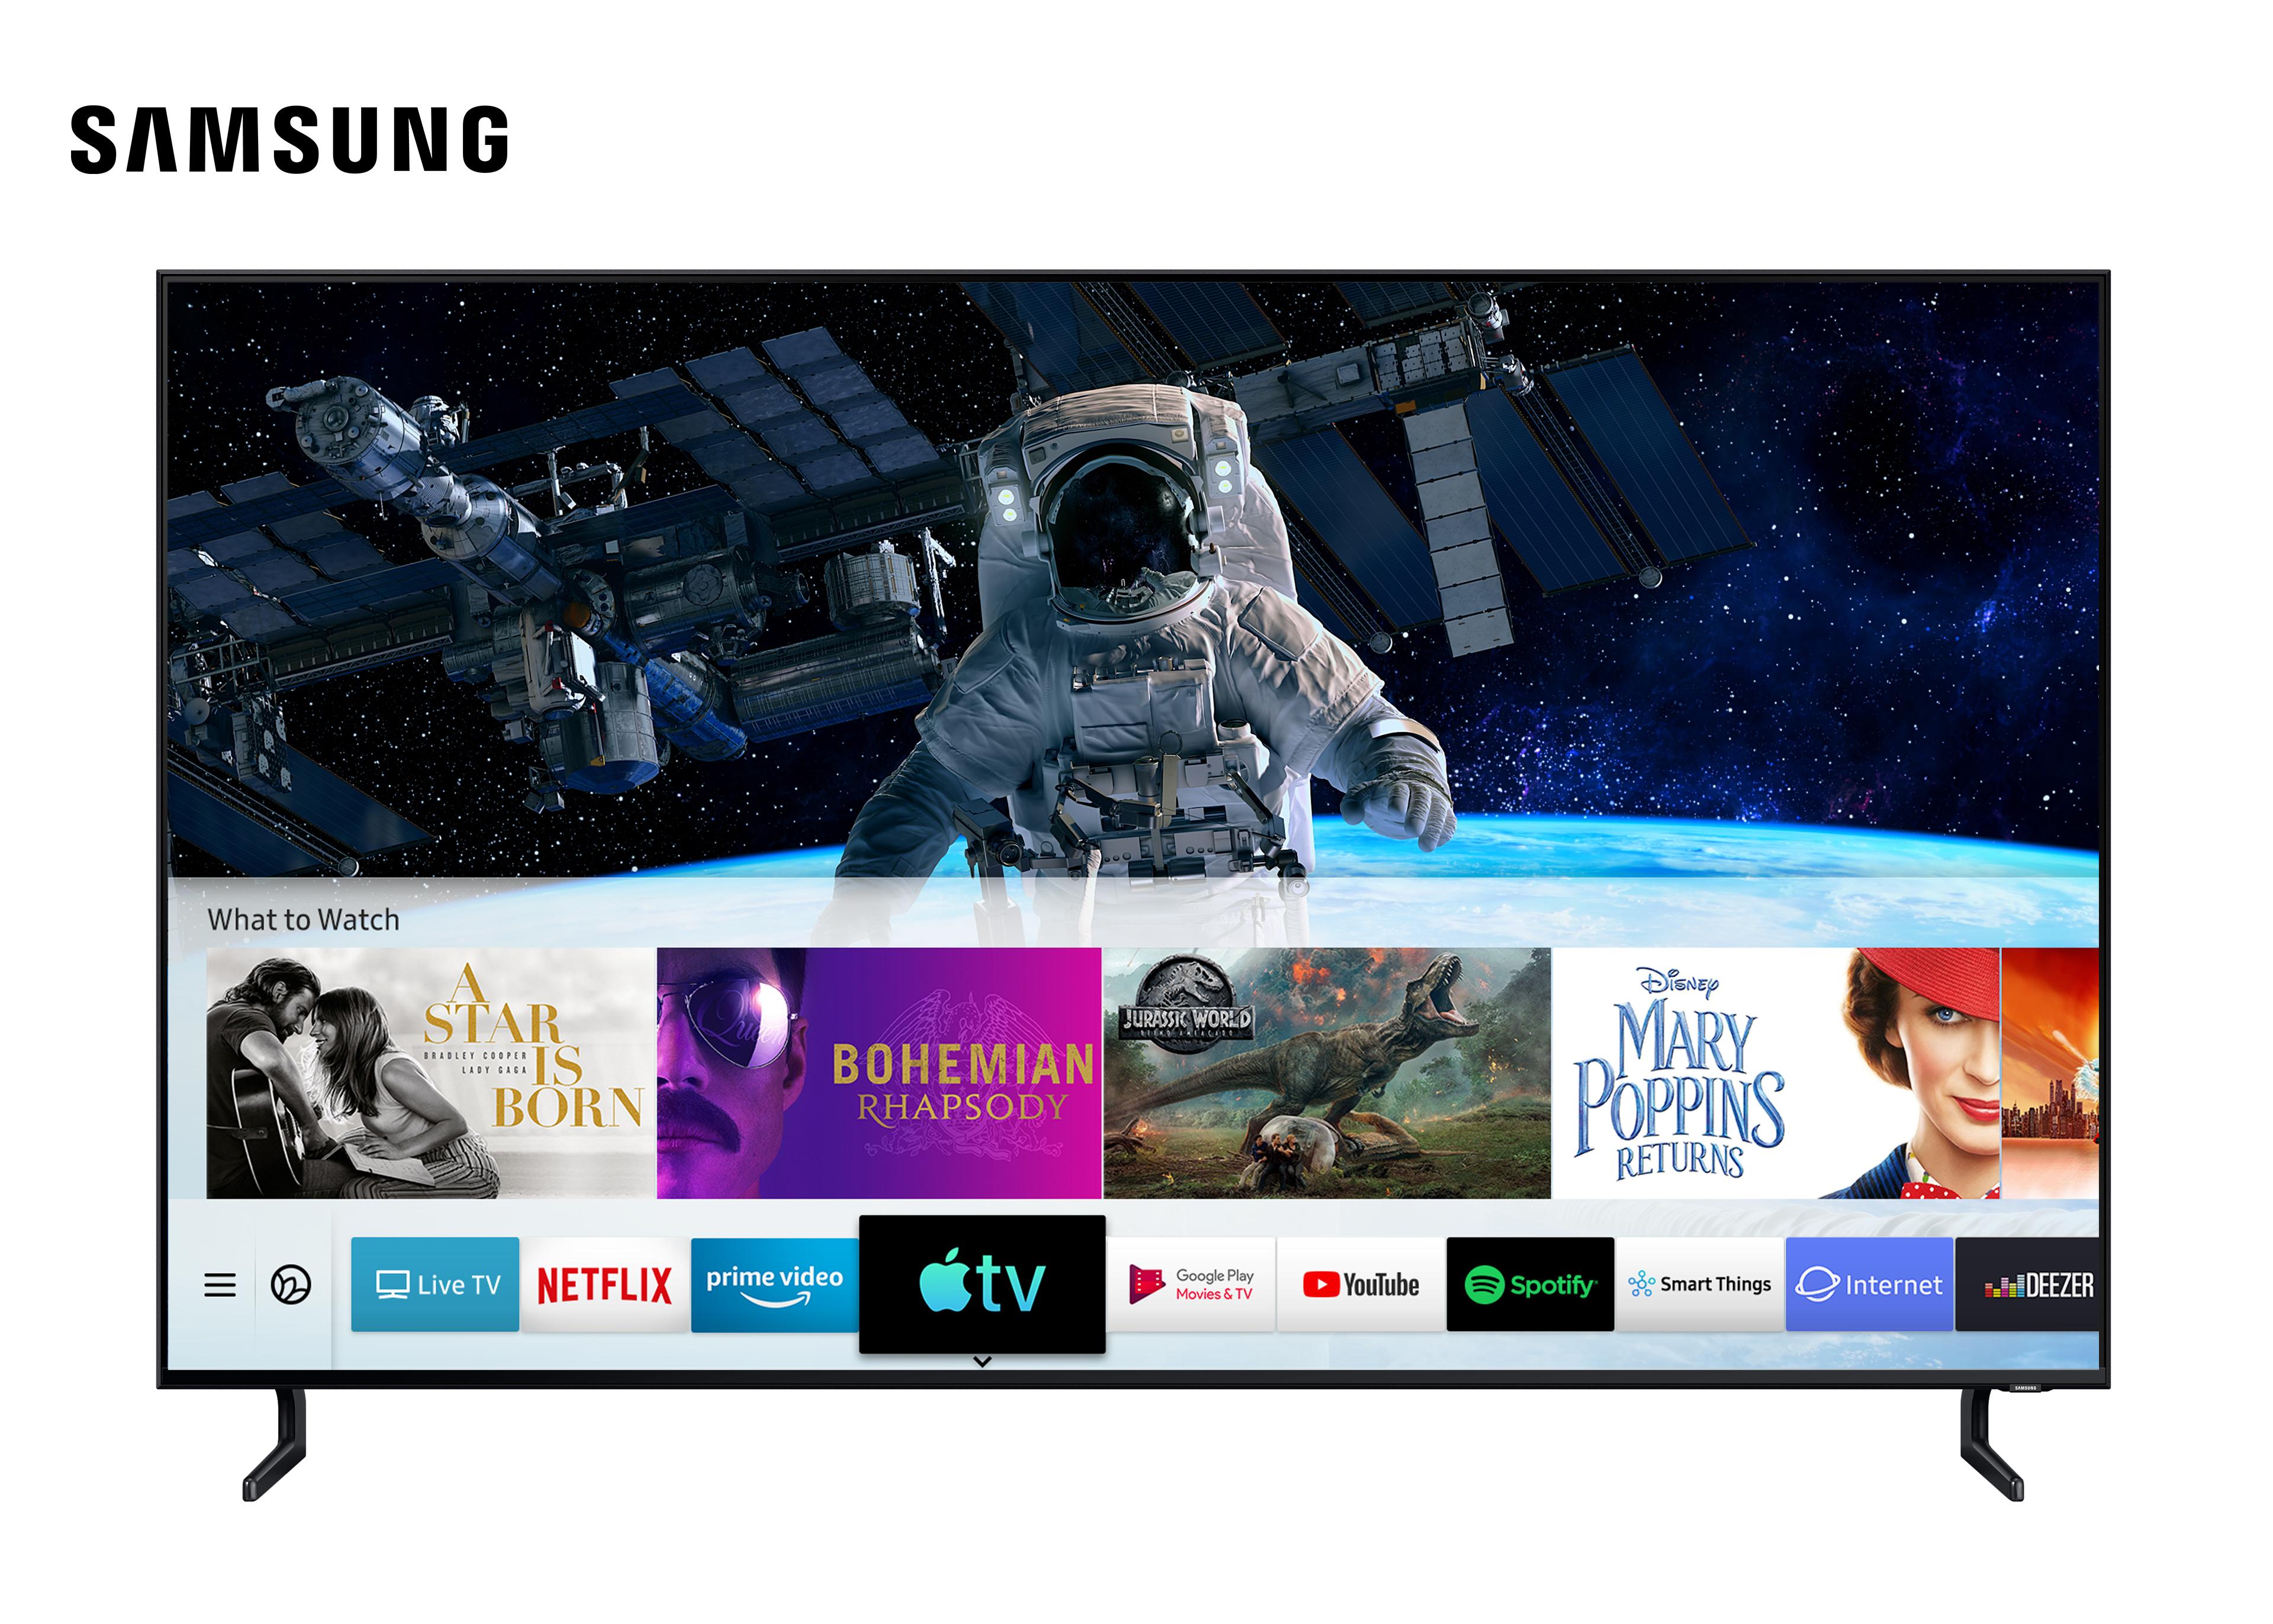 Samsung Apple TV App